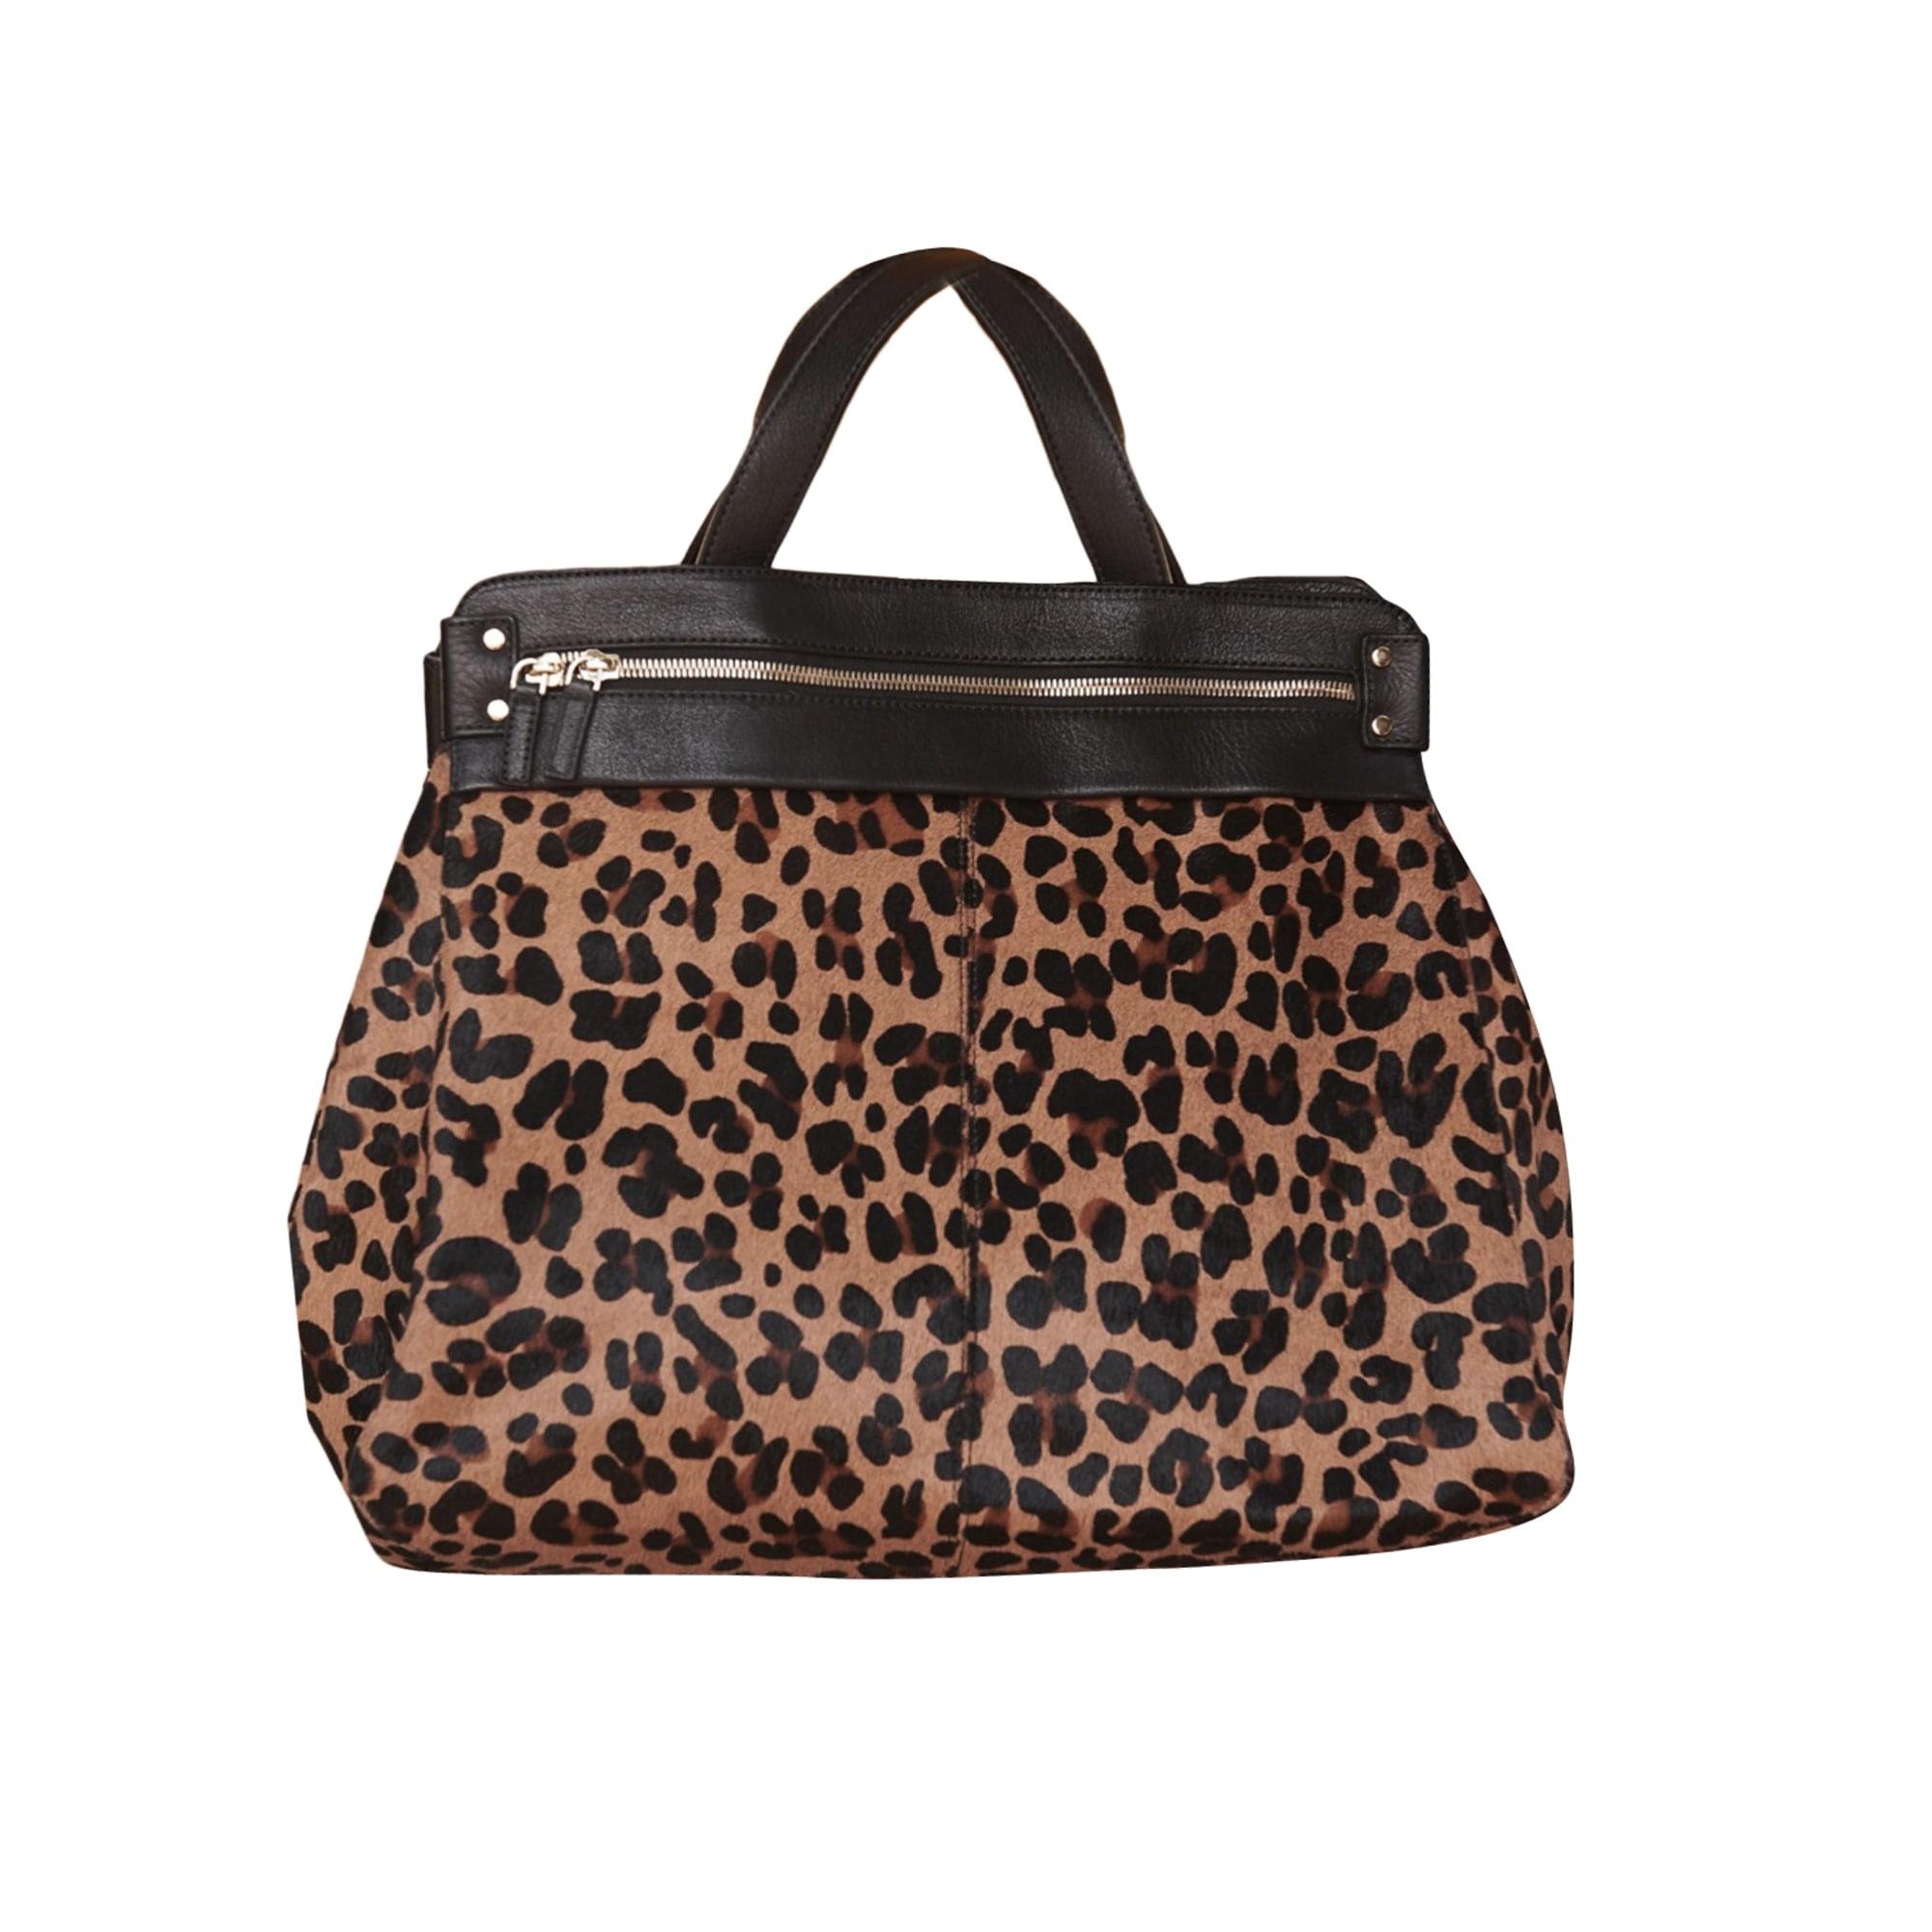 Leather Handbag SÉZANE Animal prints